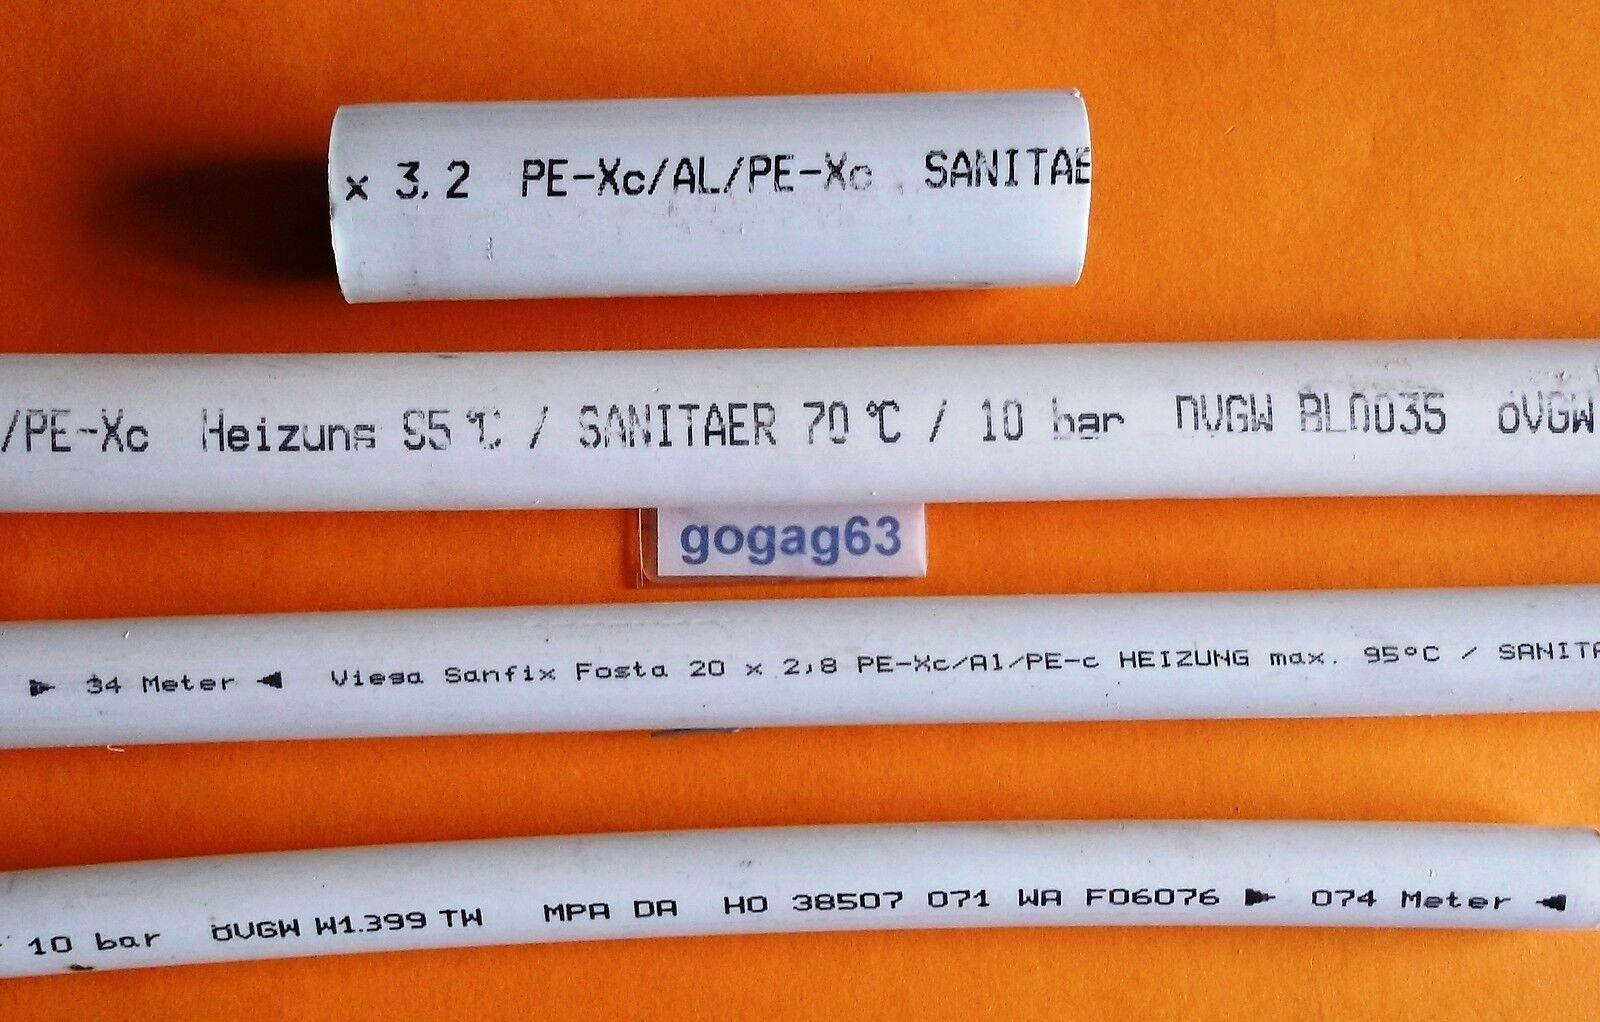 Viega Sanfix Fosta PE-Xc/Al/PE-Xc 5,0m Rohr Stange   2103  Ø40